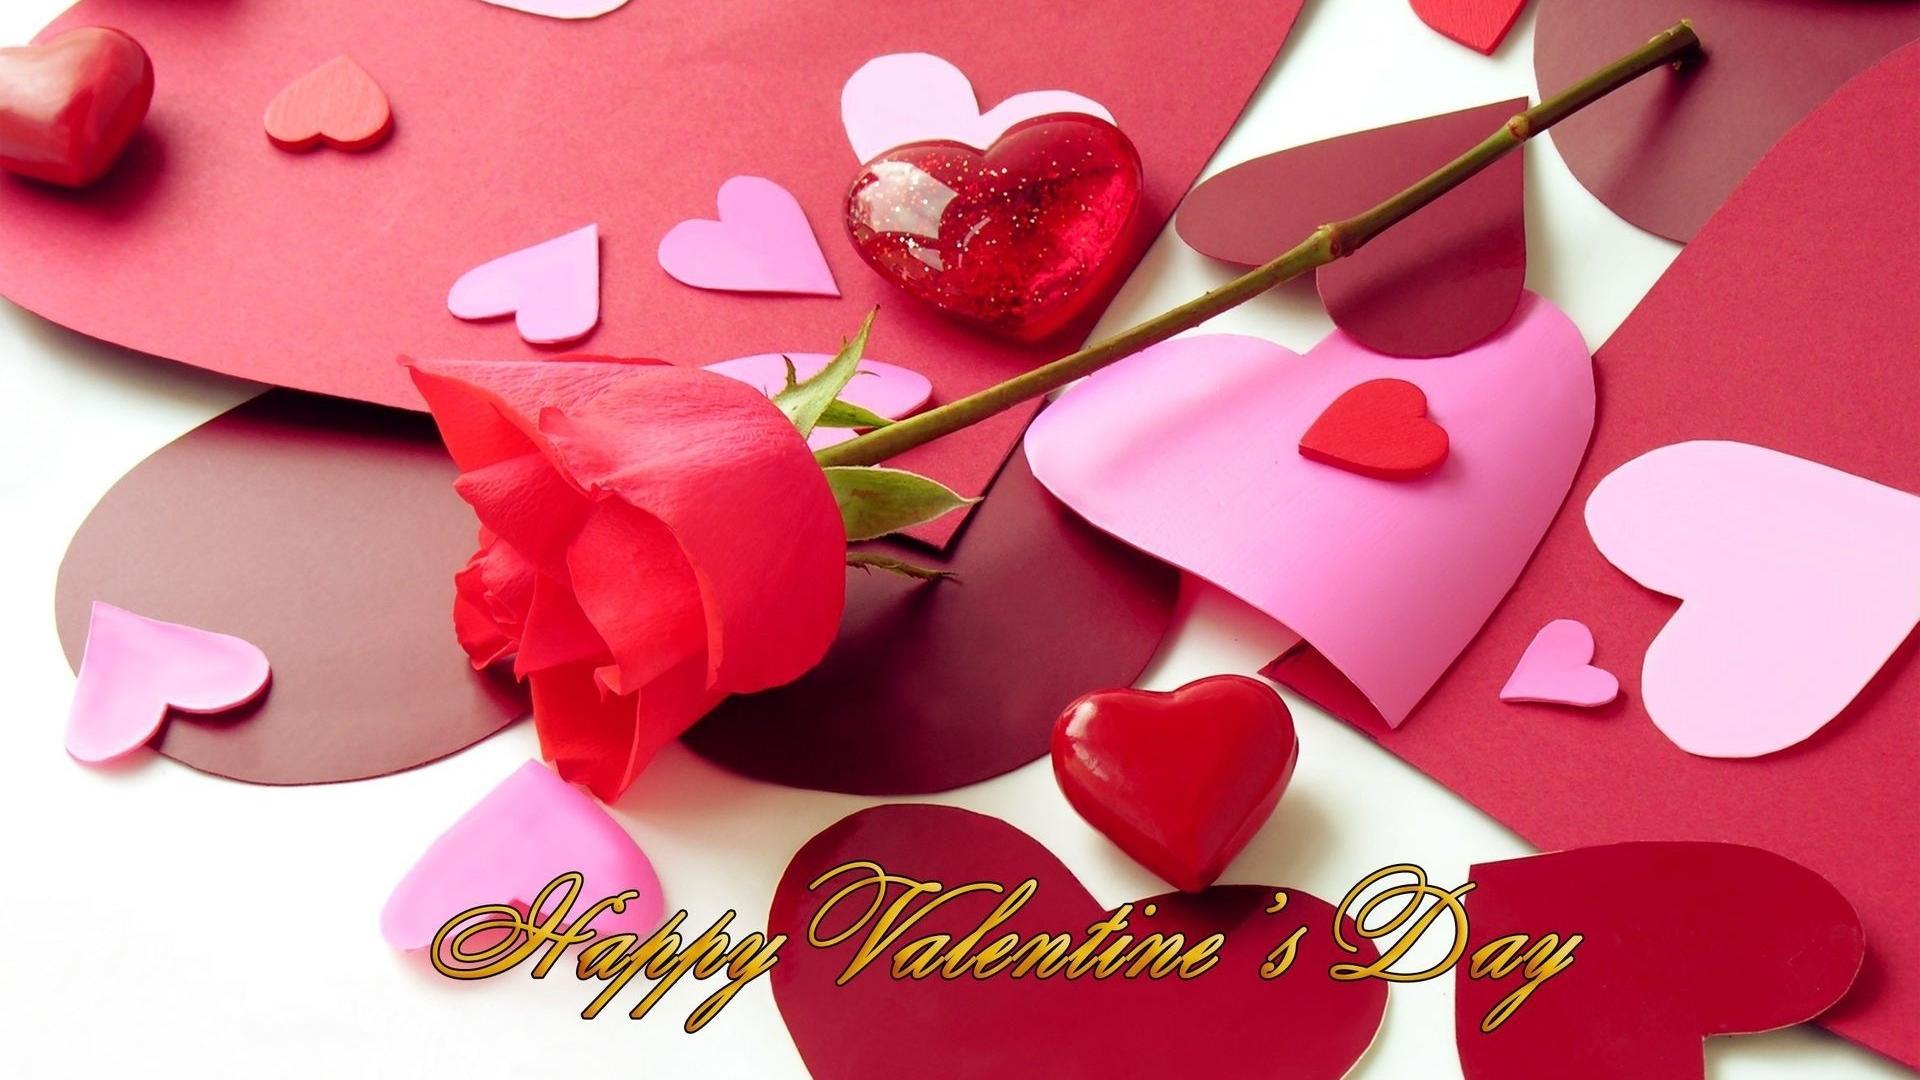 Happy Valentines Day Flower HD Wallpaper of Love   hdwallpaper2013com 1920x1080